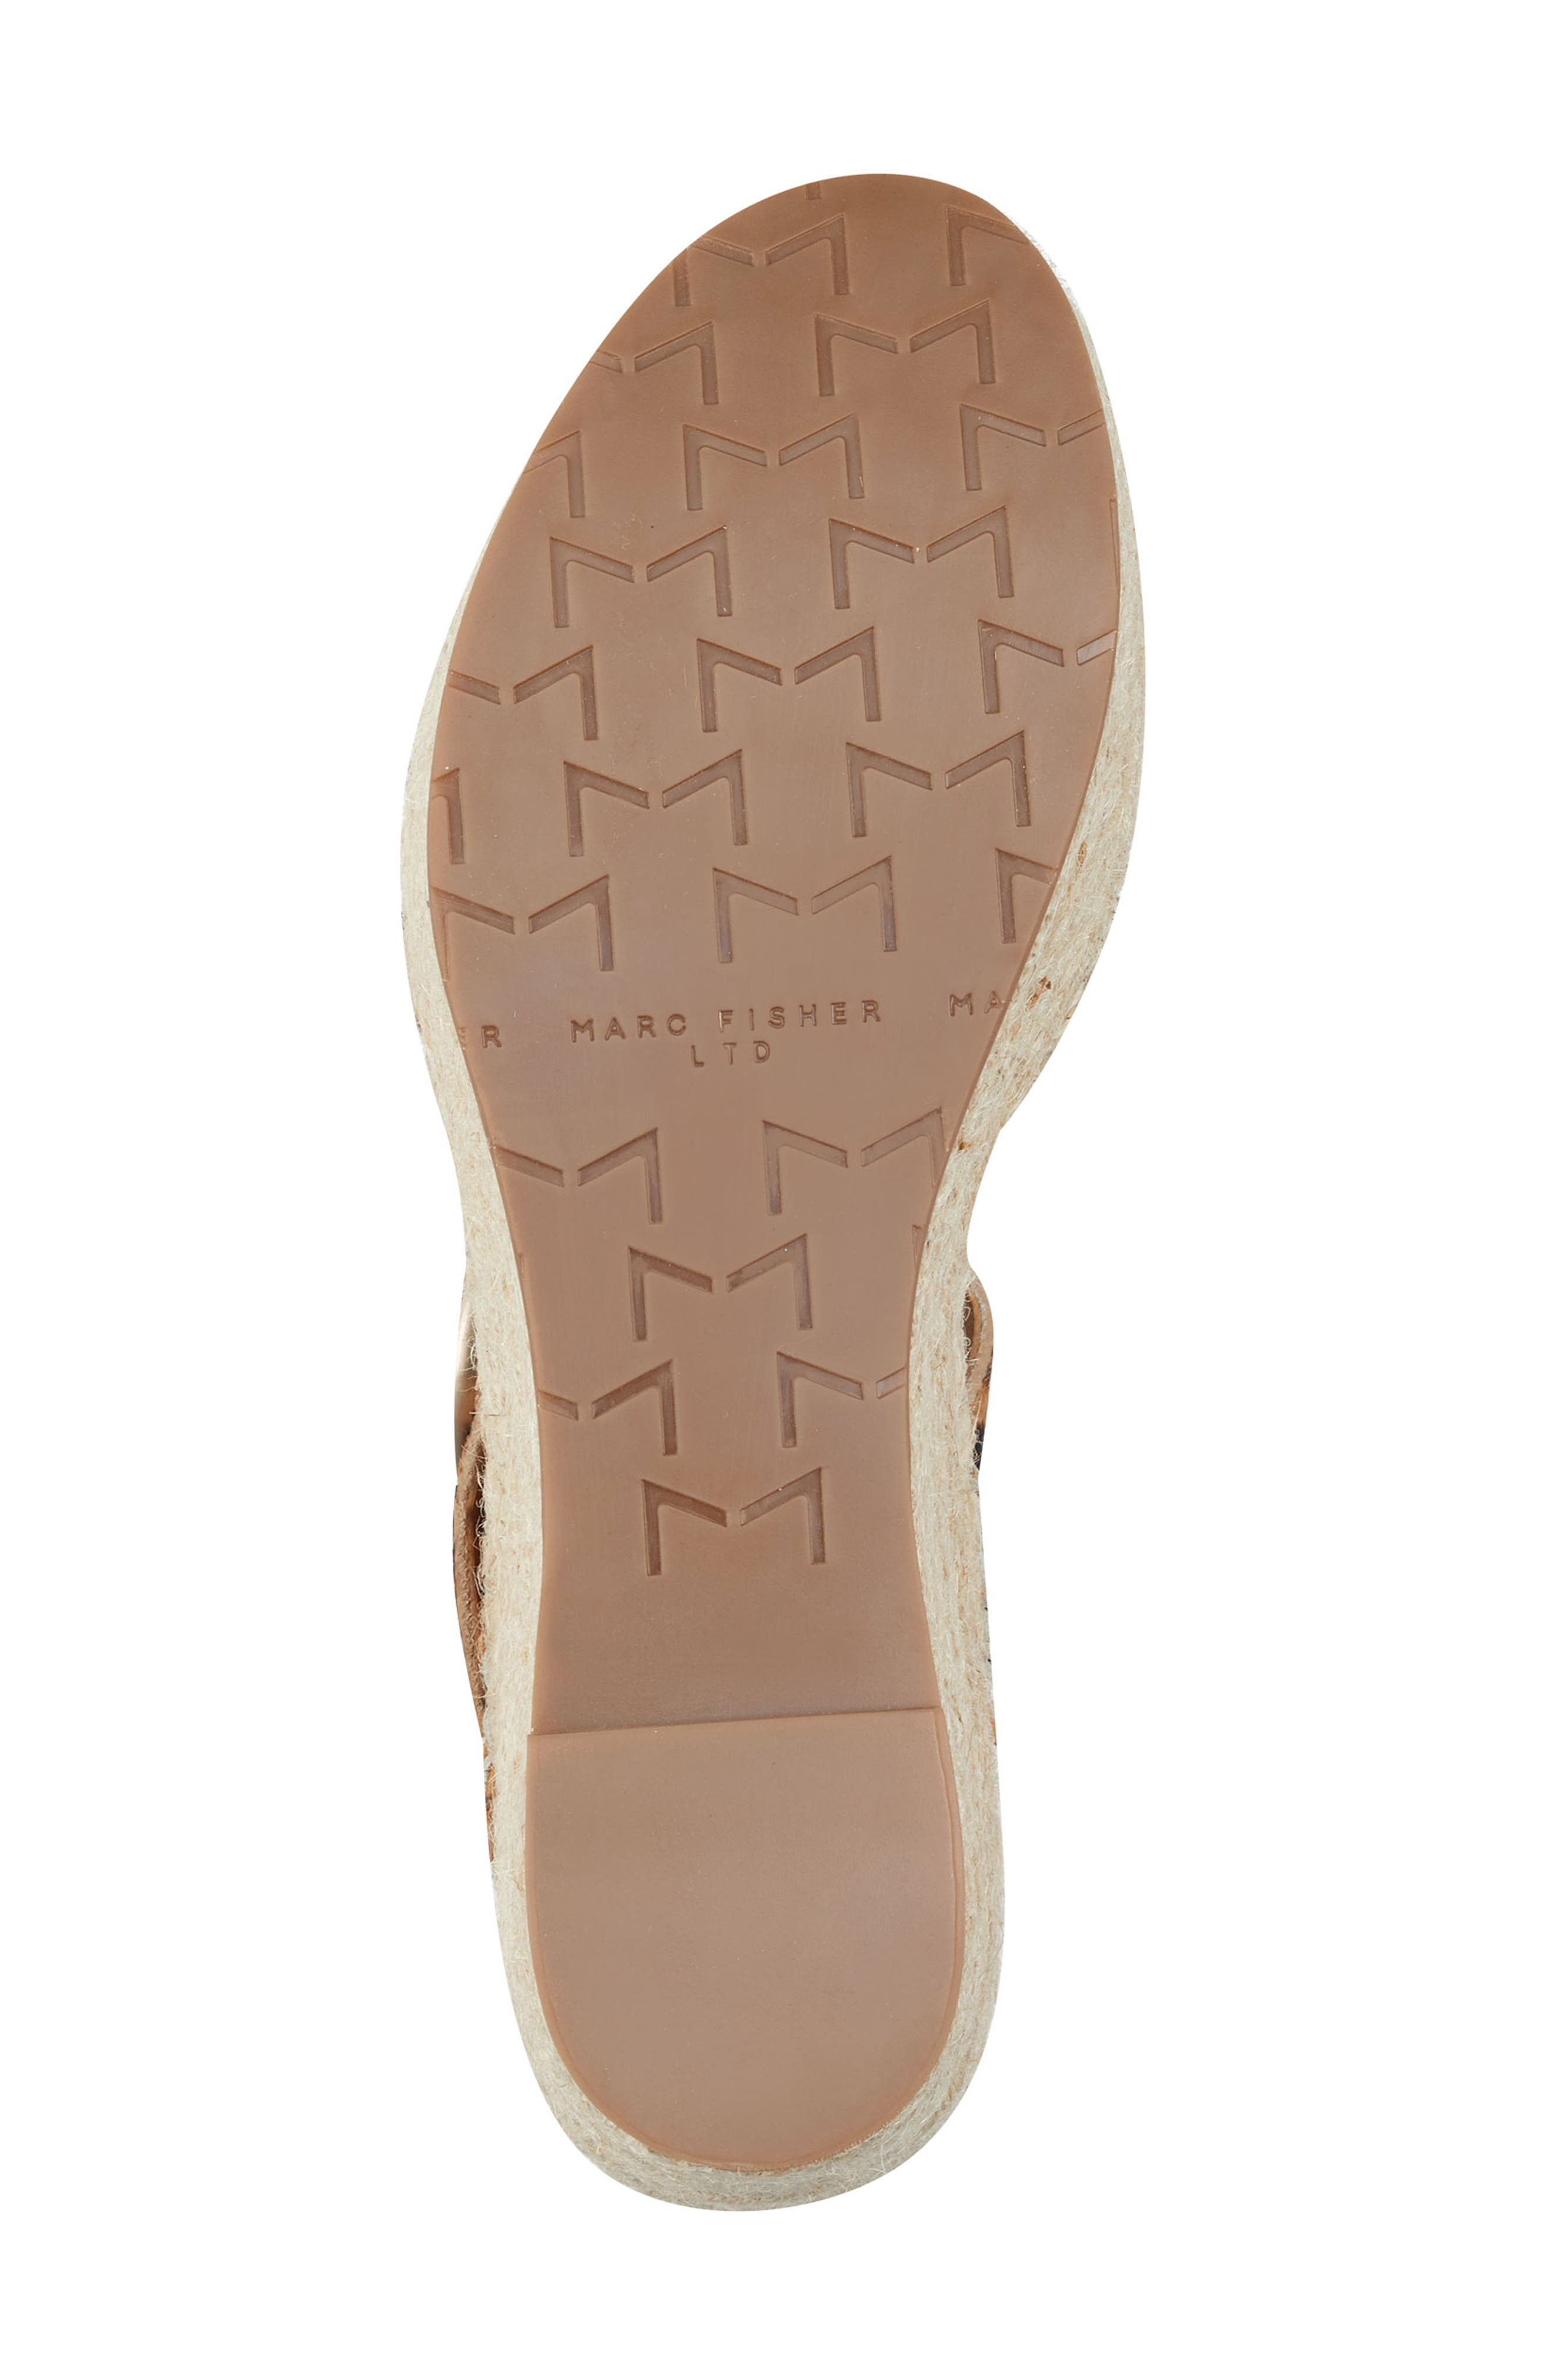 MARC FISHER LTD,                             Rexly Espadrille Platform Sandal,                             Alternate thumbnail 6, color,                             LEOPARD HAIR CALF